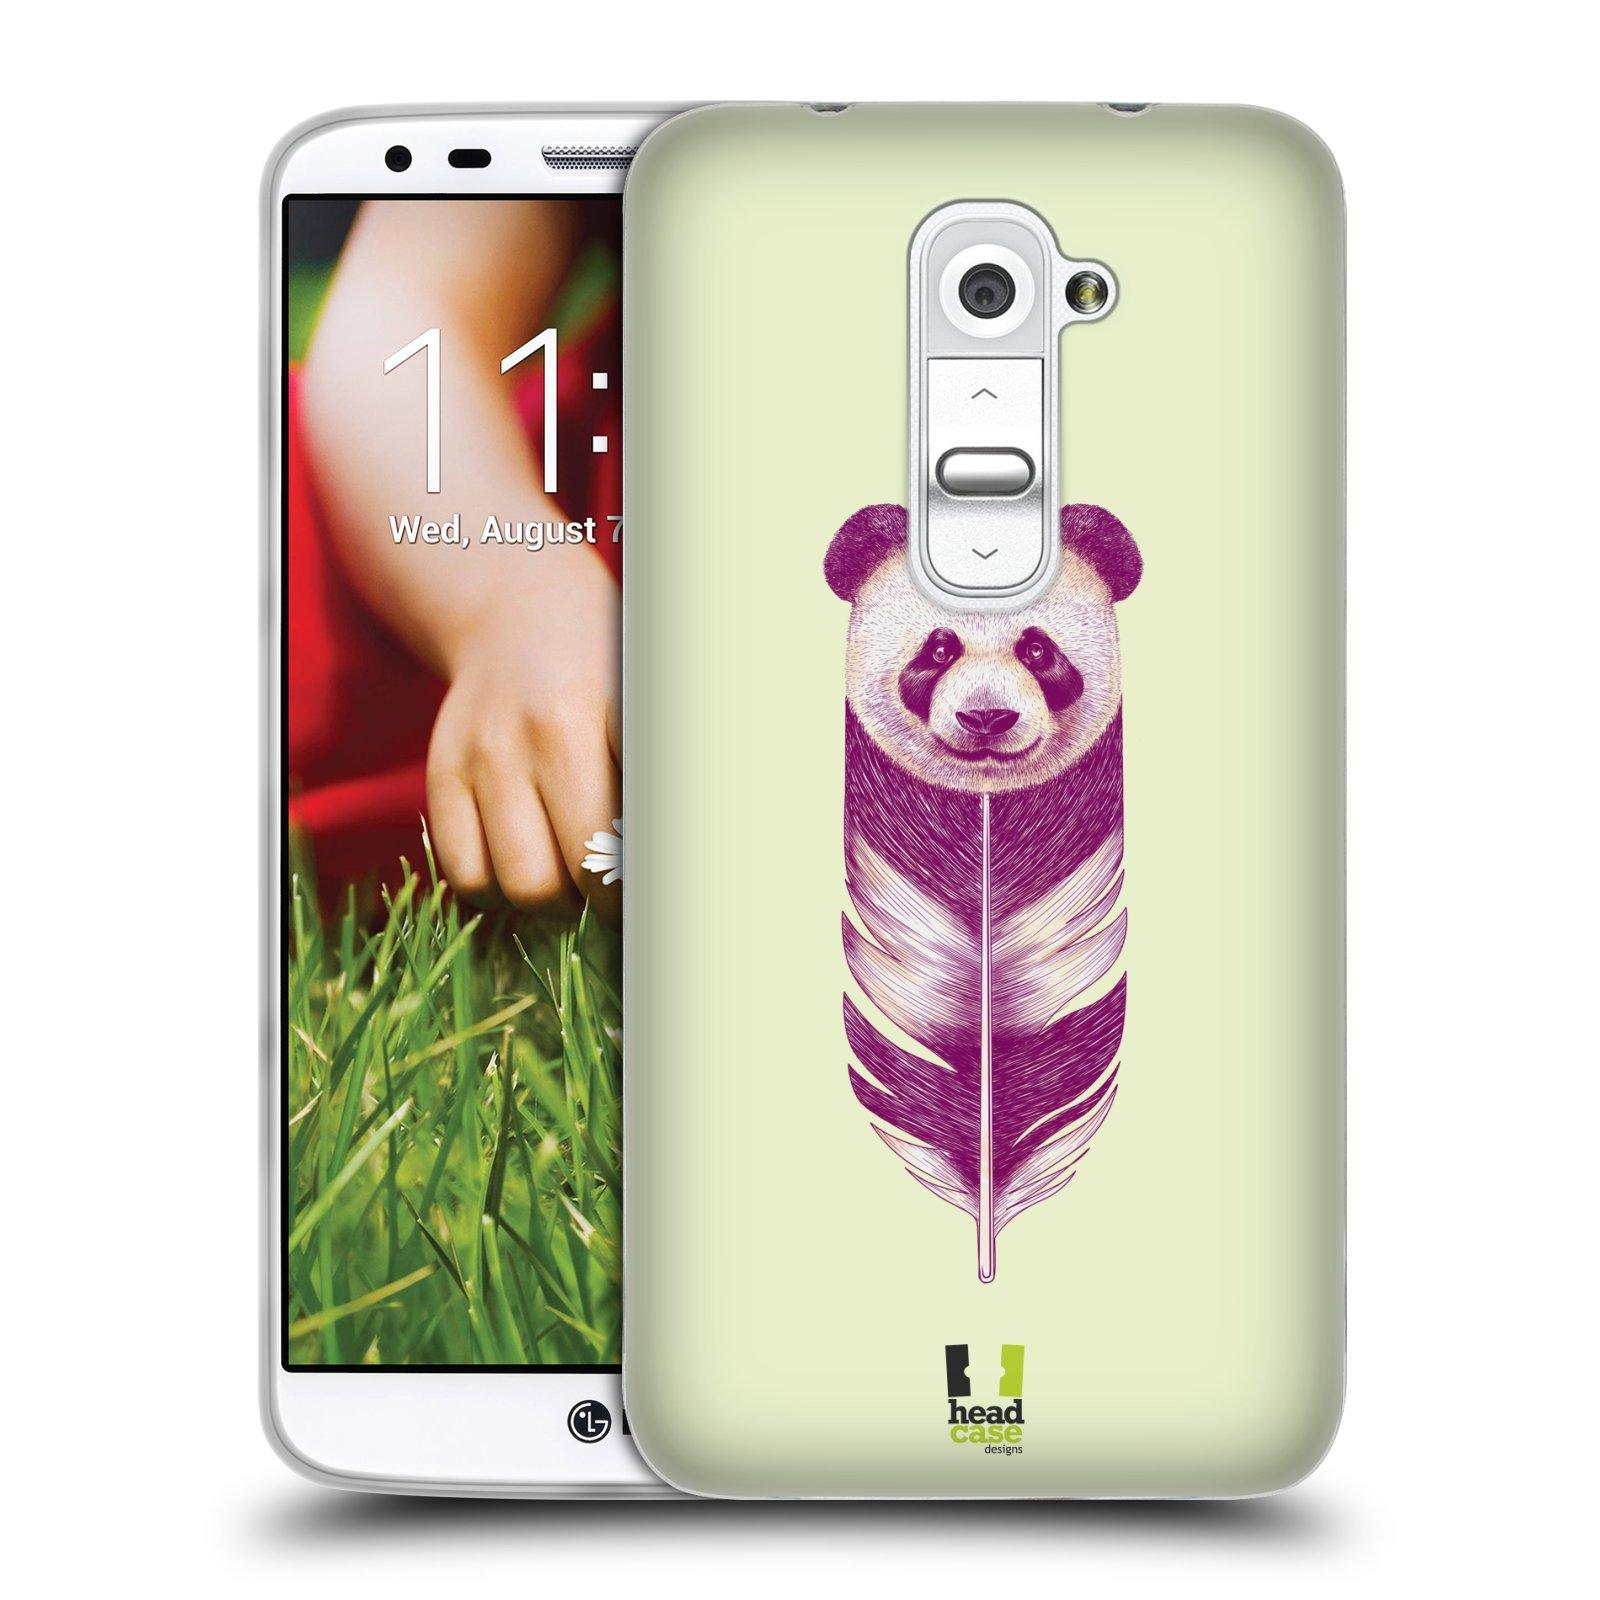 HEAD CASE silikonový obal na mobil LG G2 vzor zvířecí pírka panda